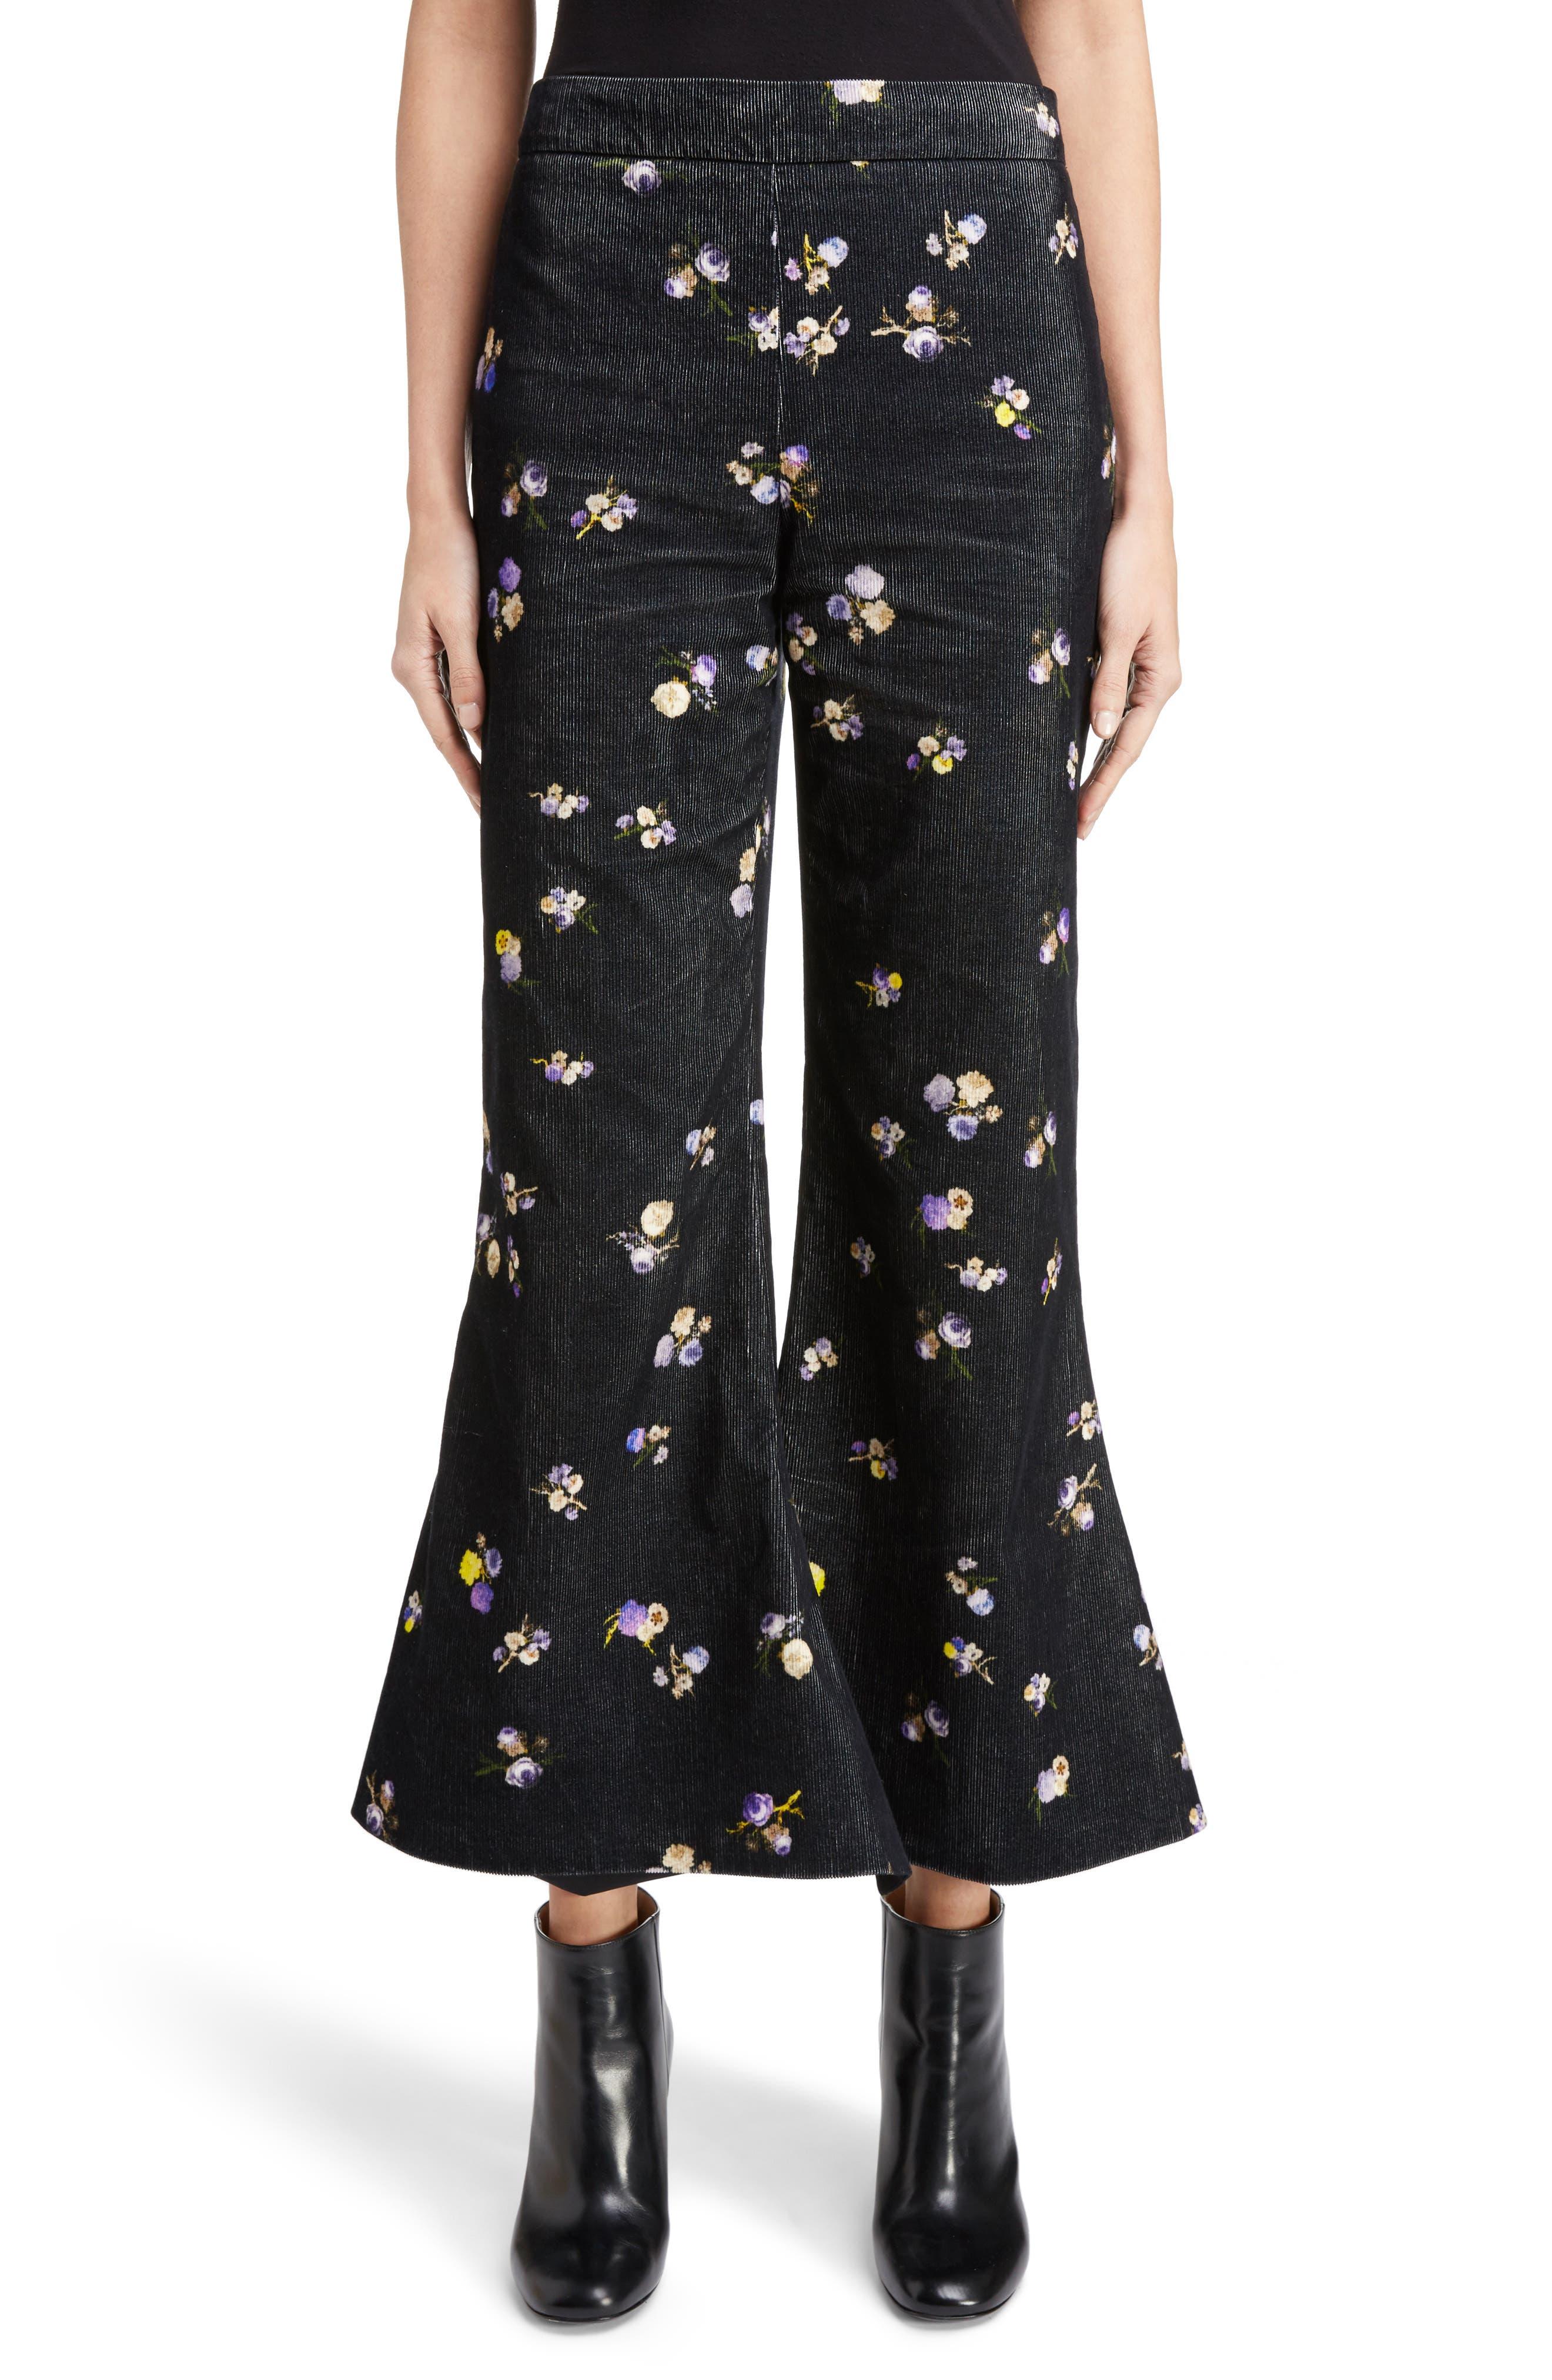 Tyme Floral Corduroy Wide Leg Pants,                         Main,                         color, Small Flower Black